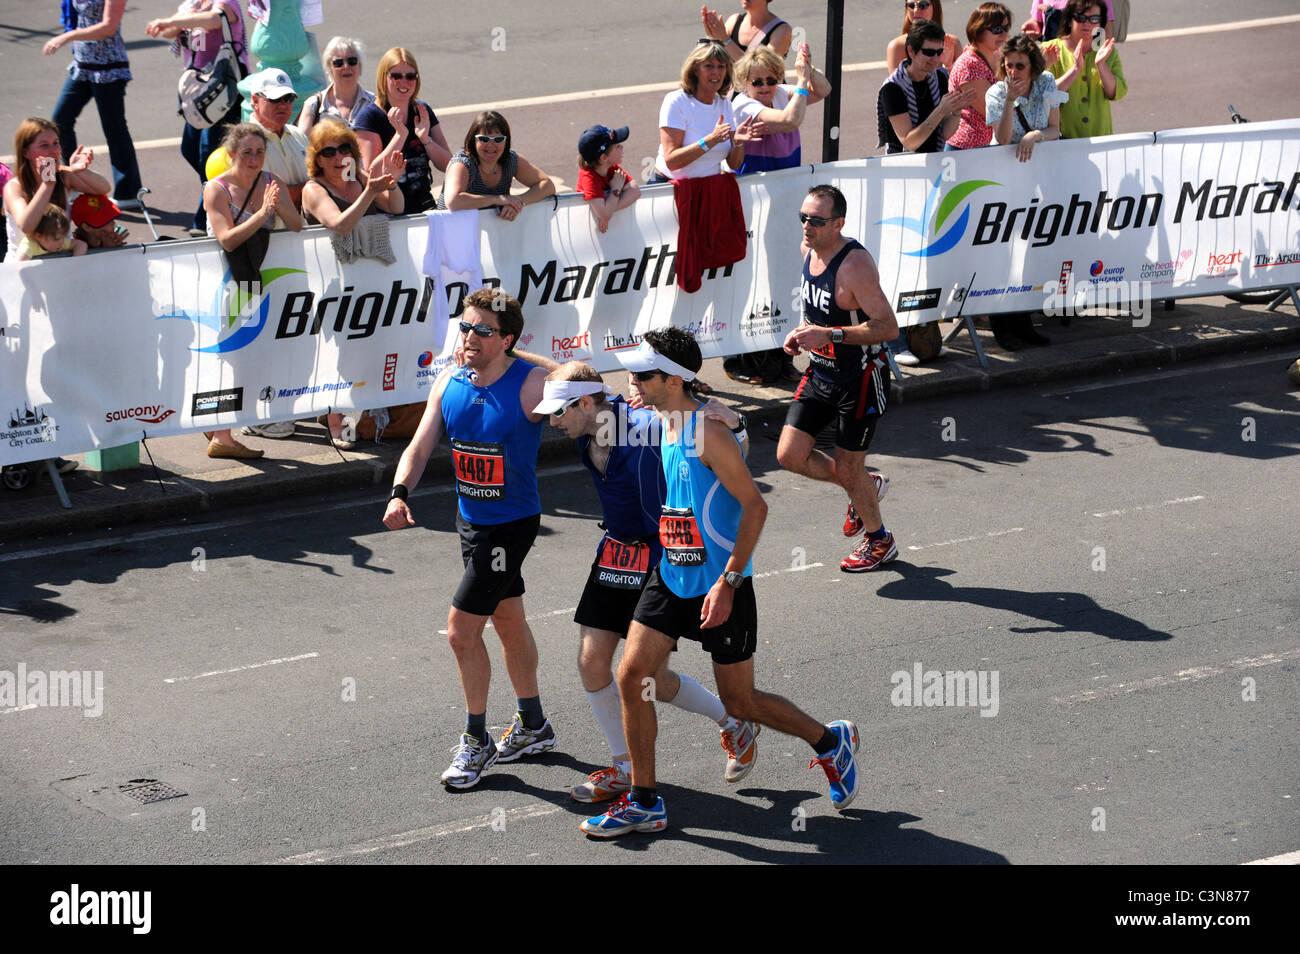 Brighton Marathon 2011 - Exhausted runners help each other ...